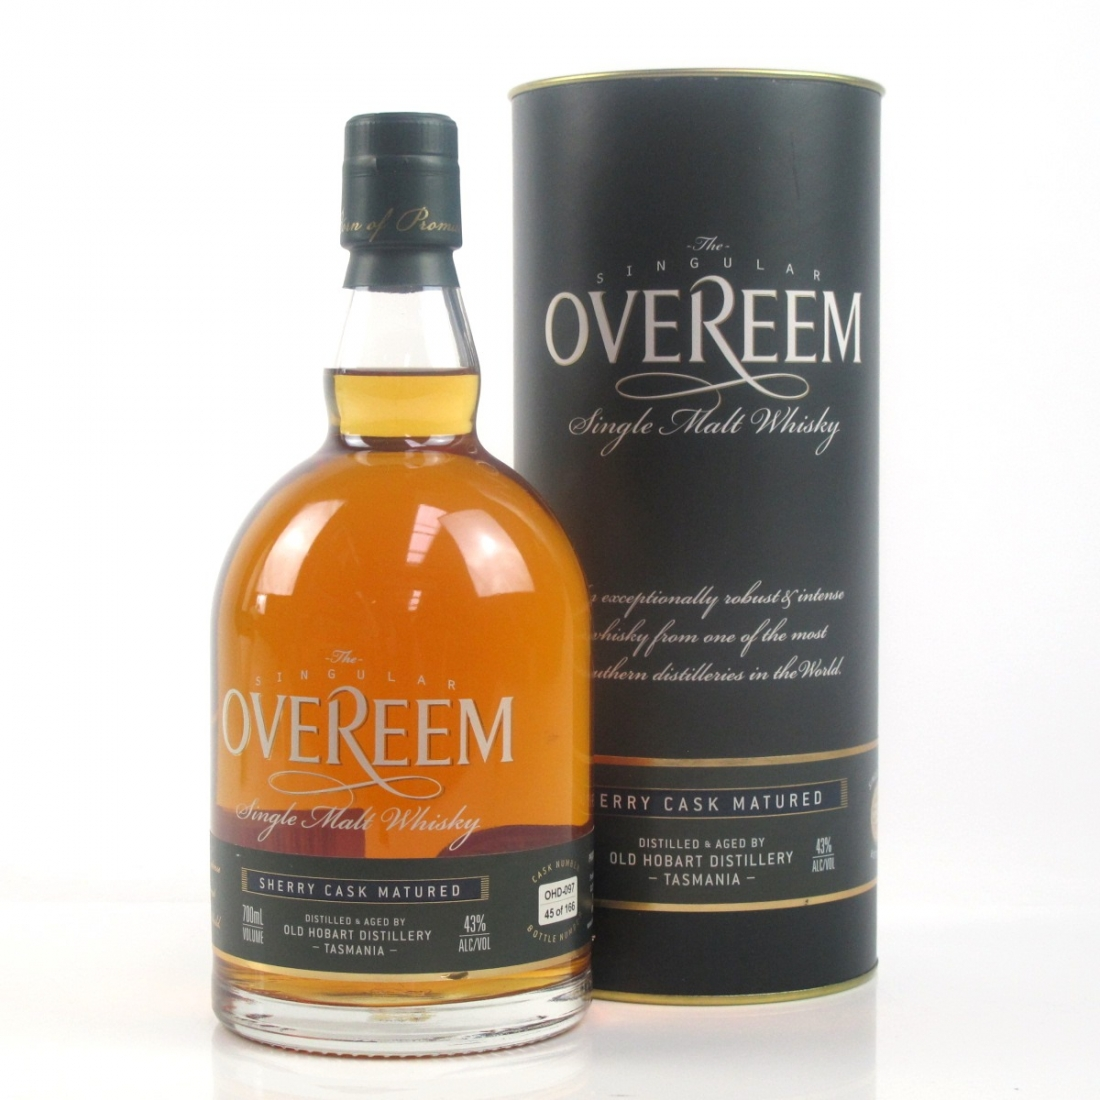 Overeem Tasmanian Single Malt Sherry Cask